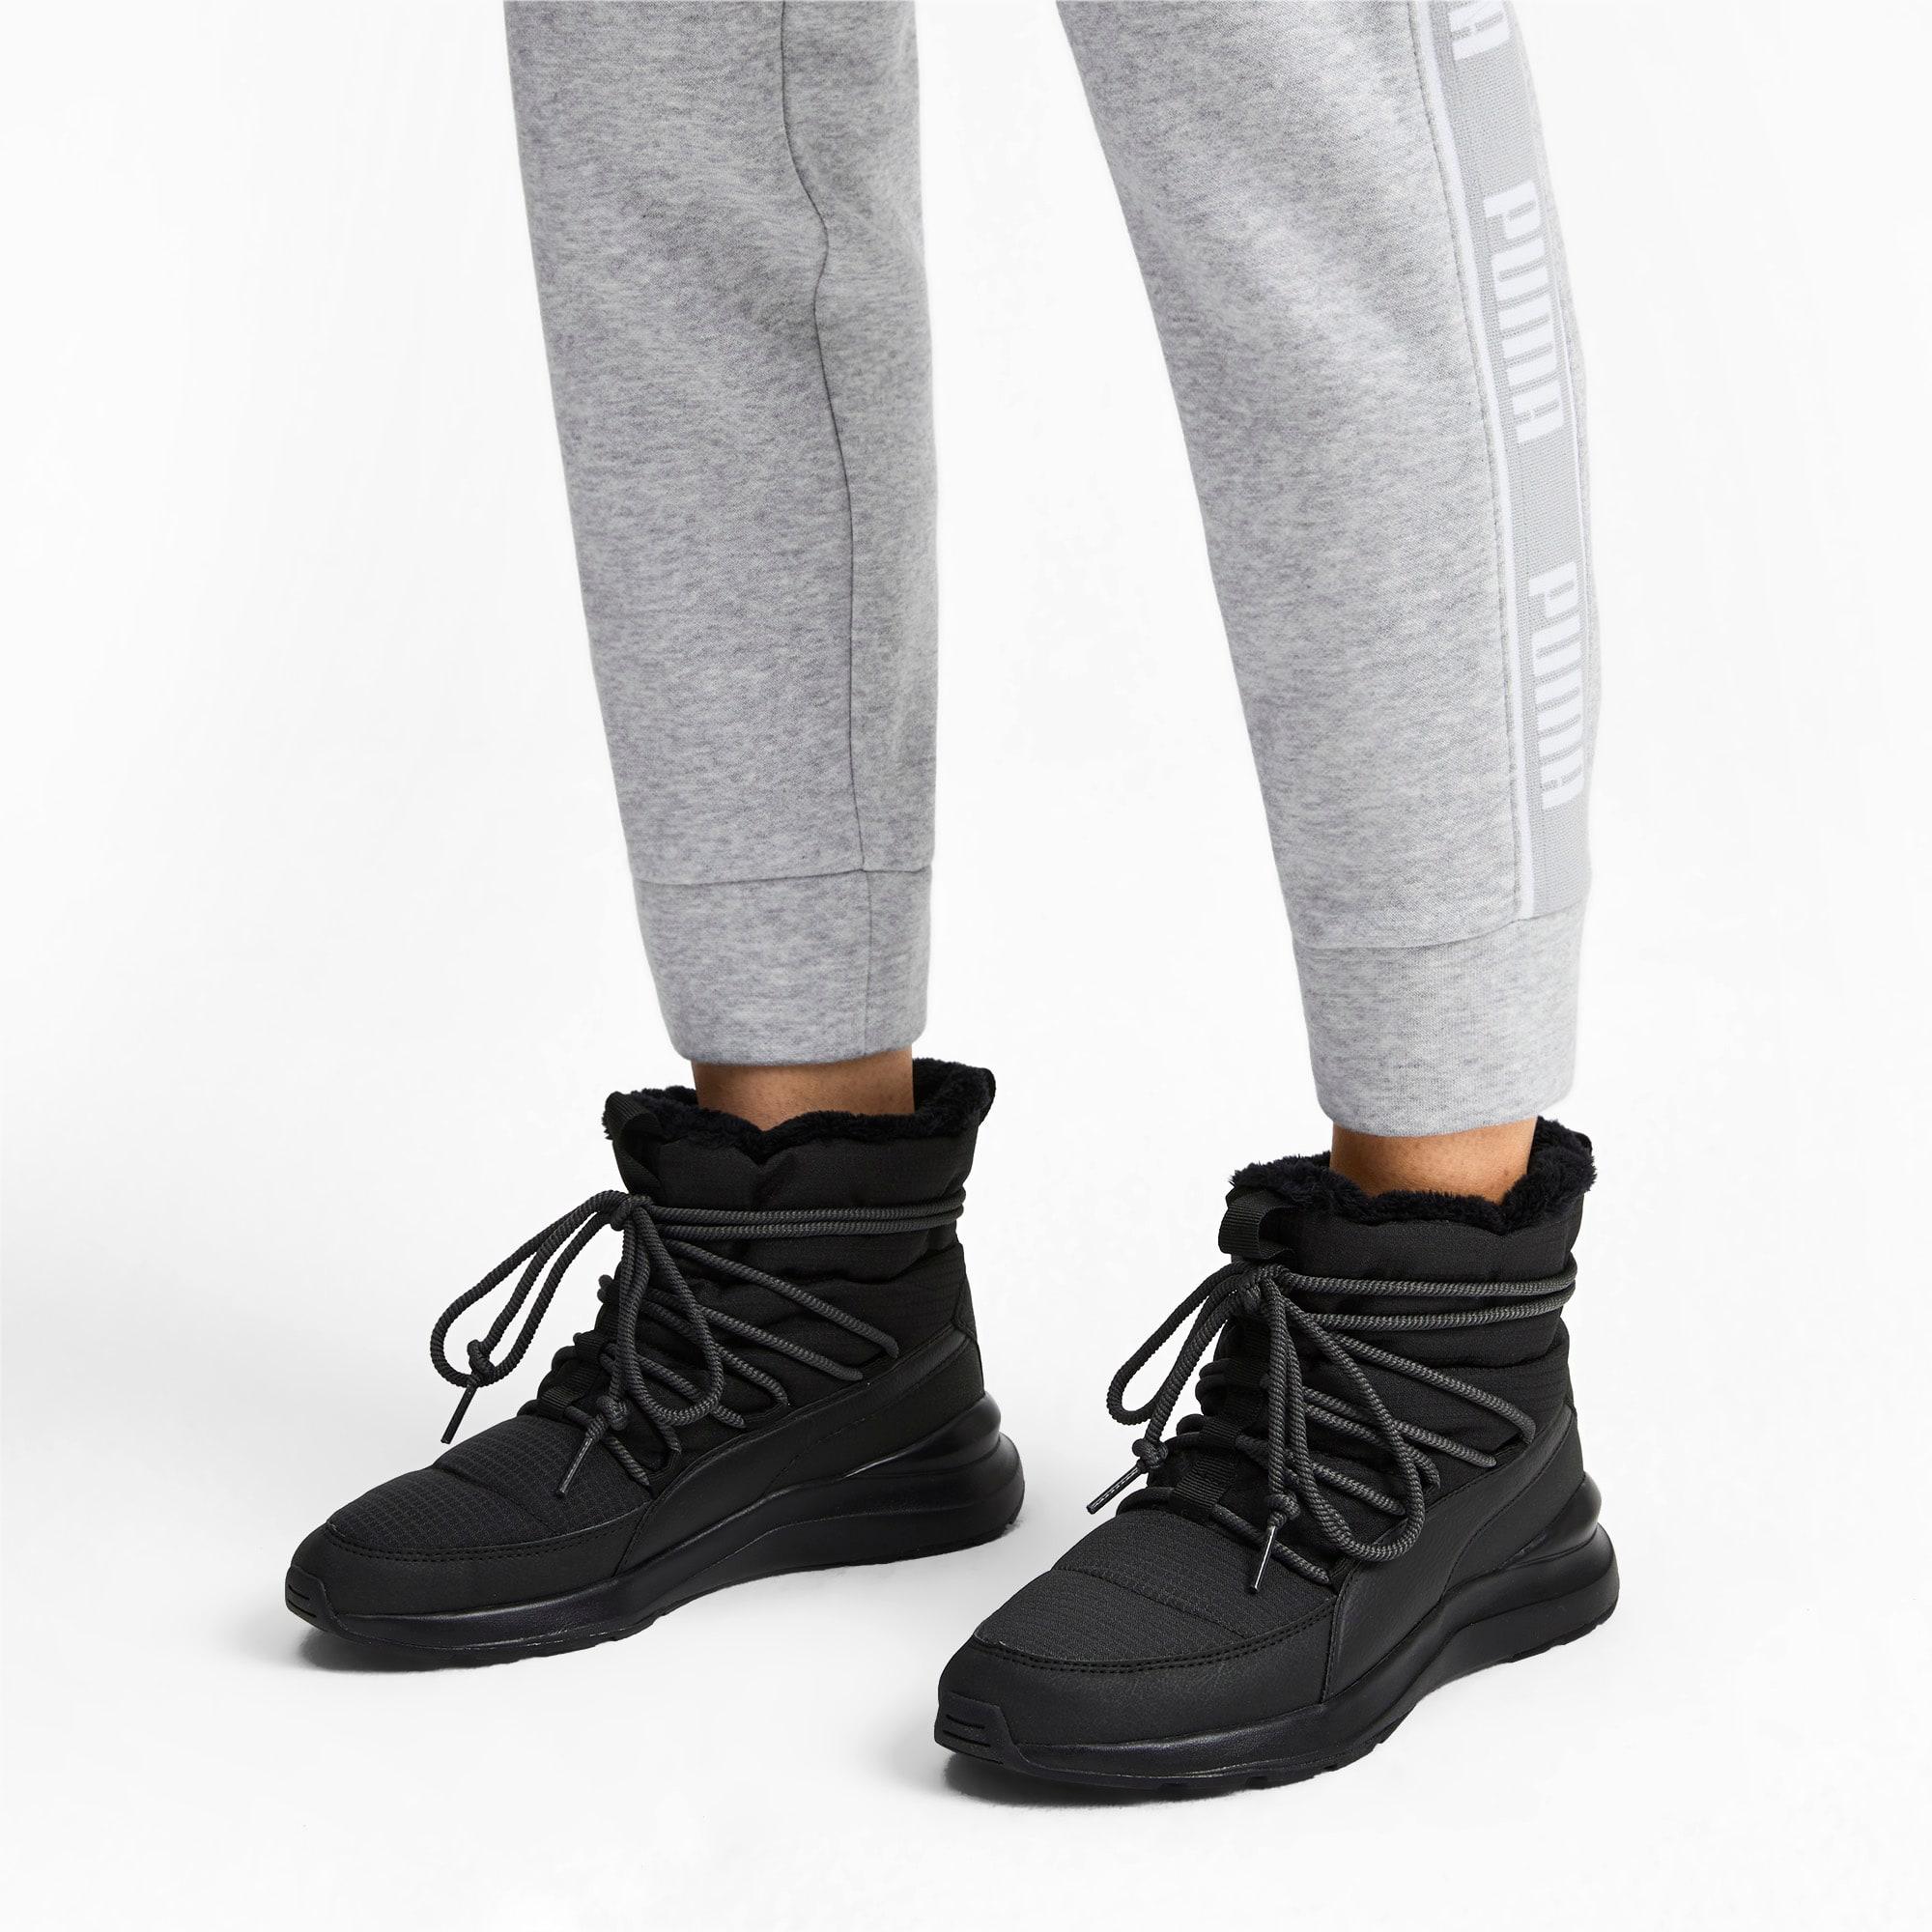 puma scarpe invernali donna